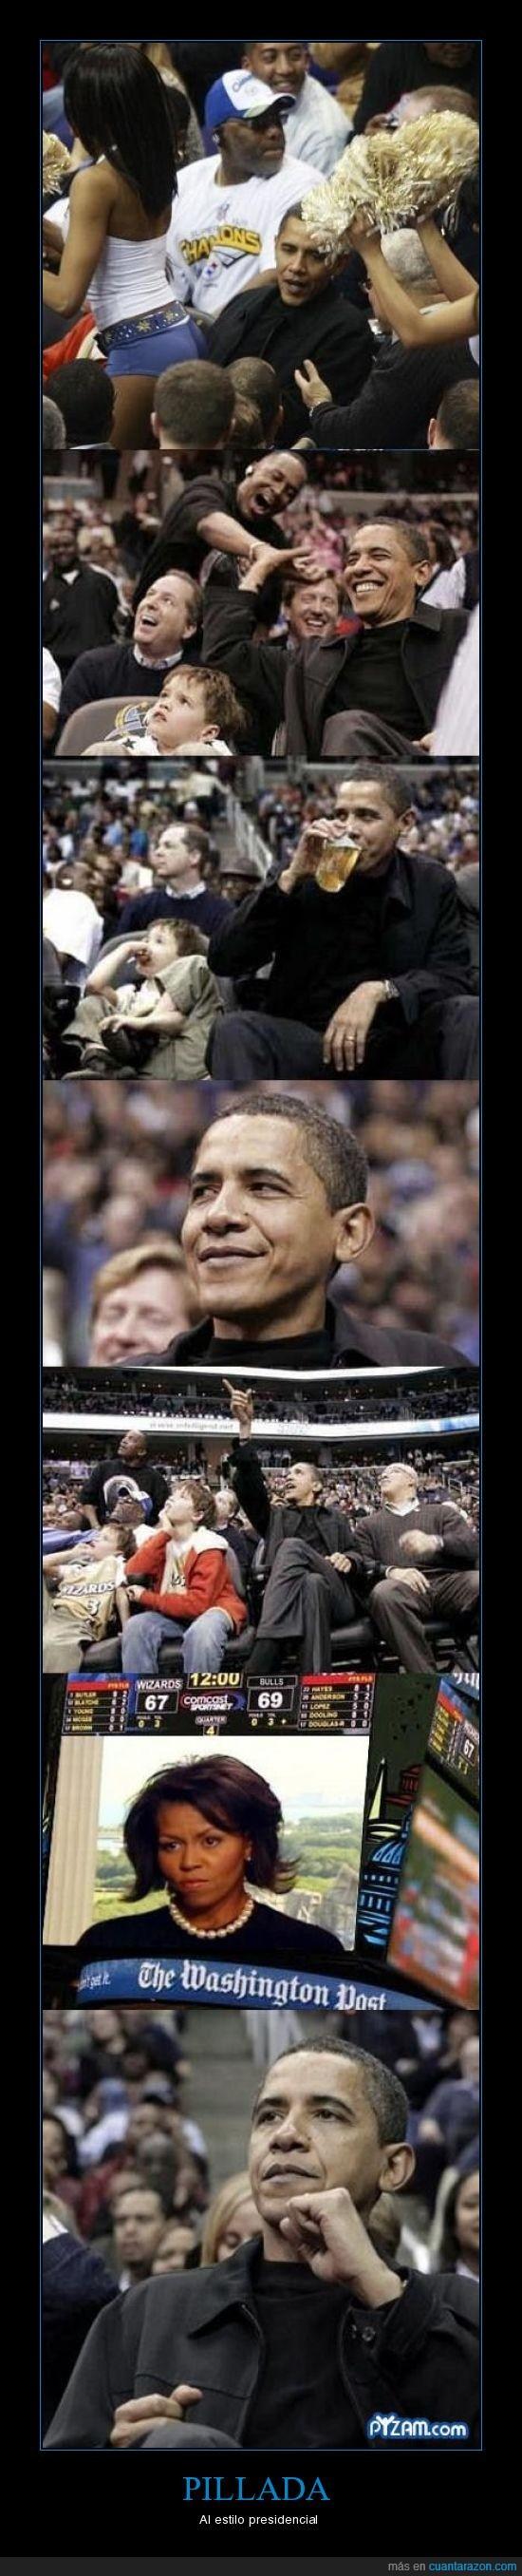 baloncesto,mujer,obama,partido